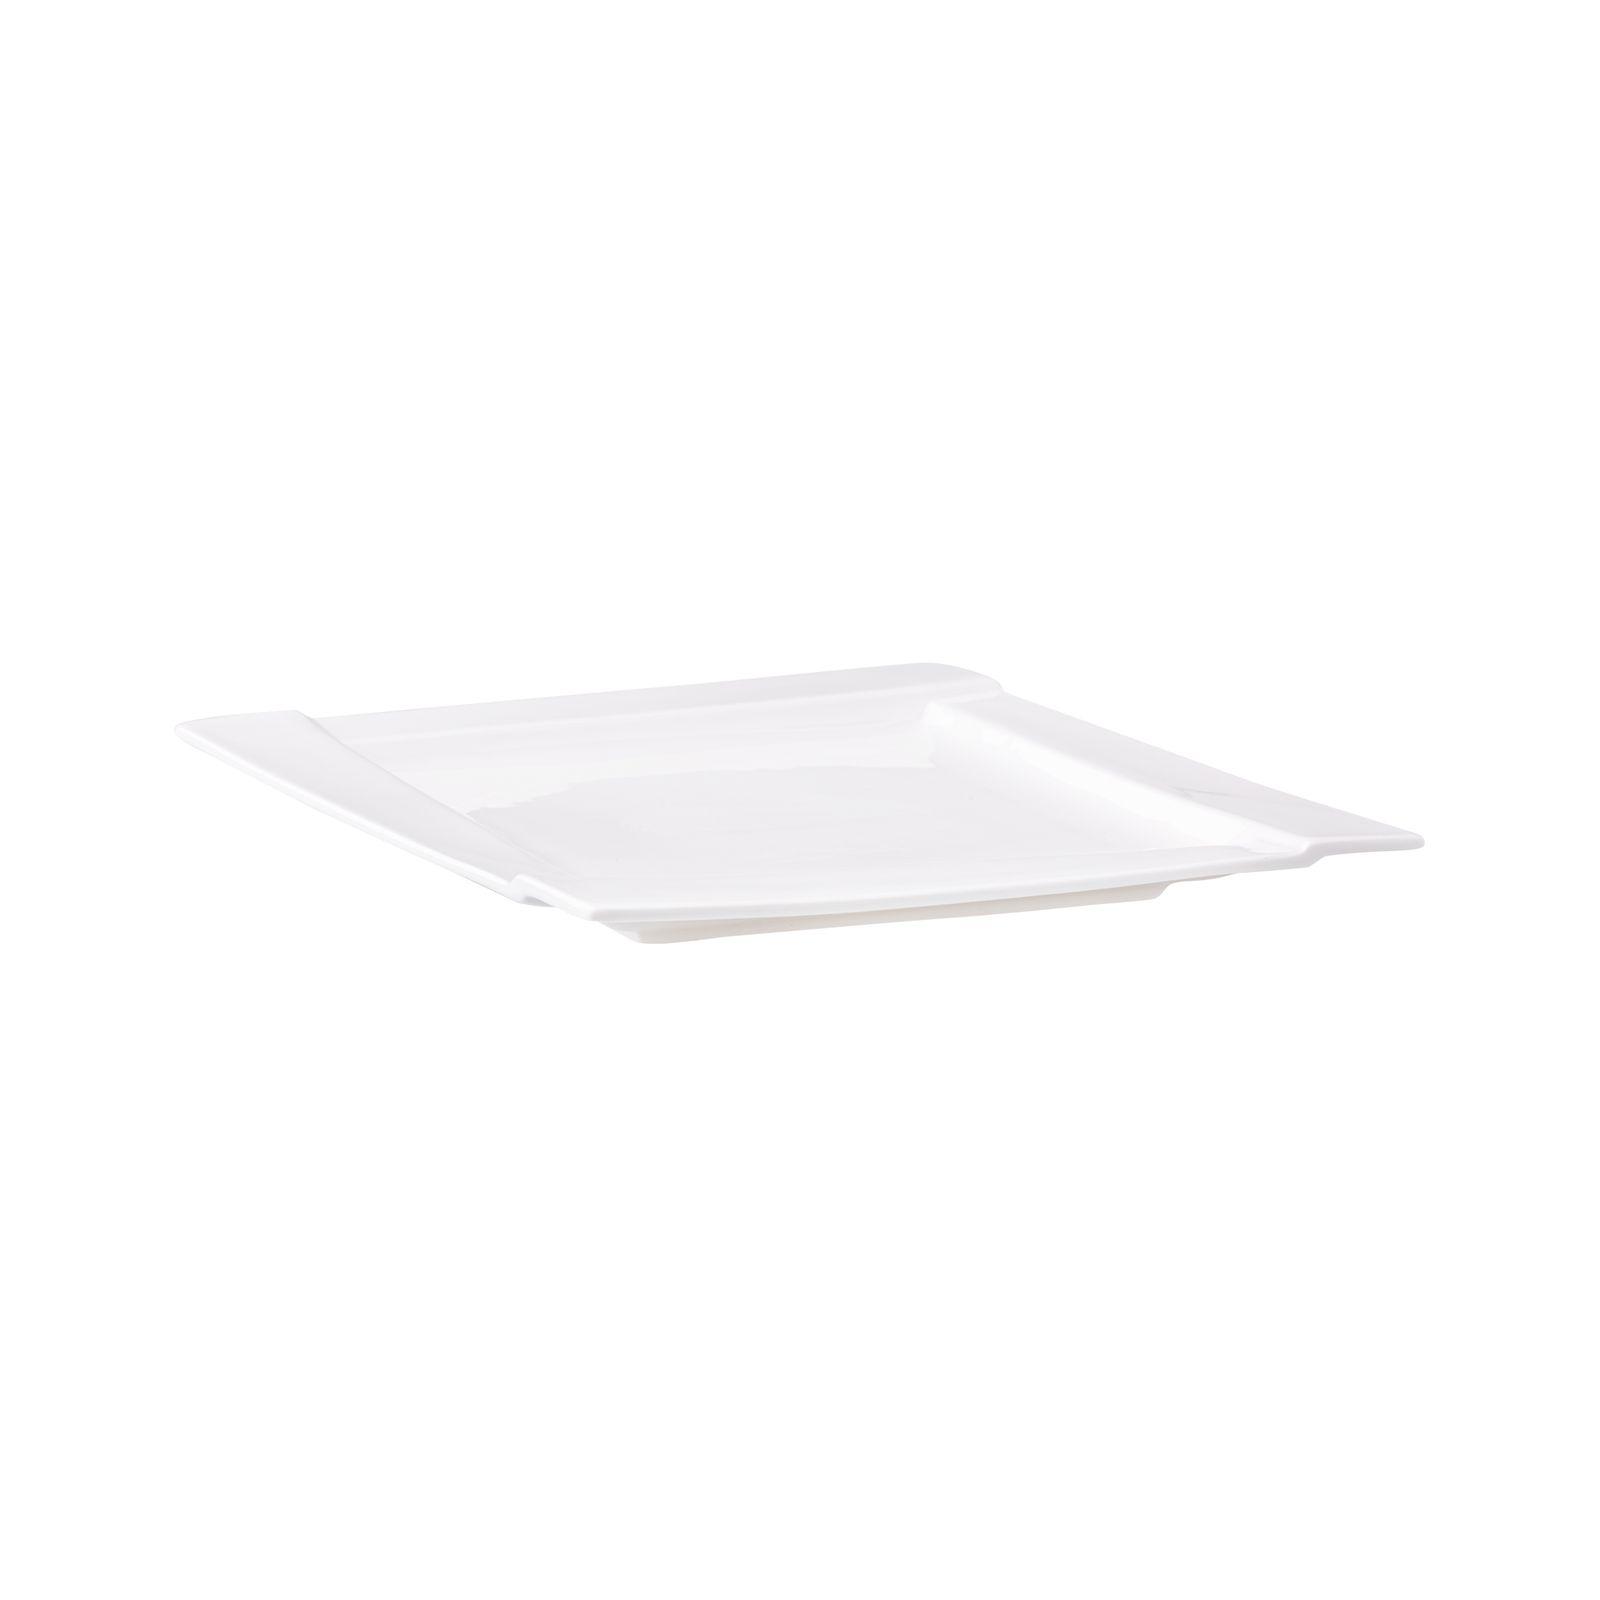 Serving dish square platter Kubiko 31 x 31 cm AMBITION